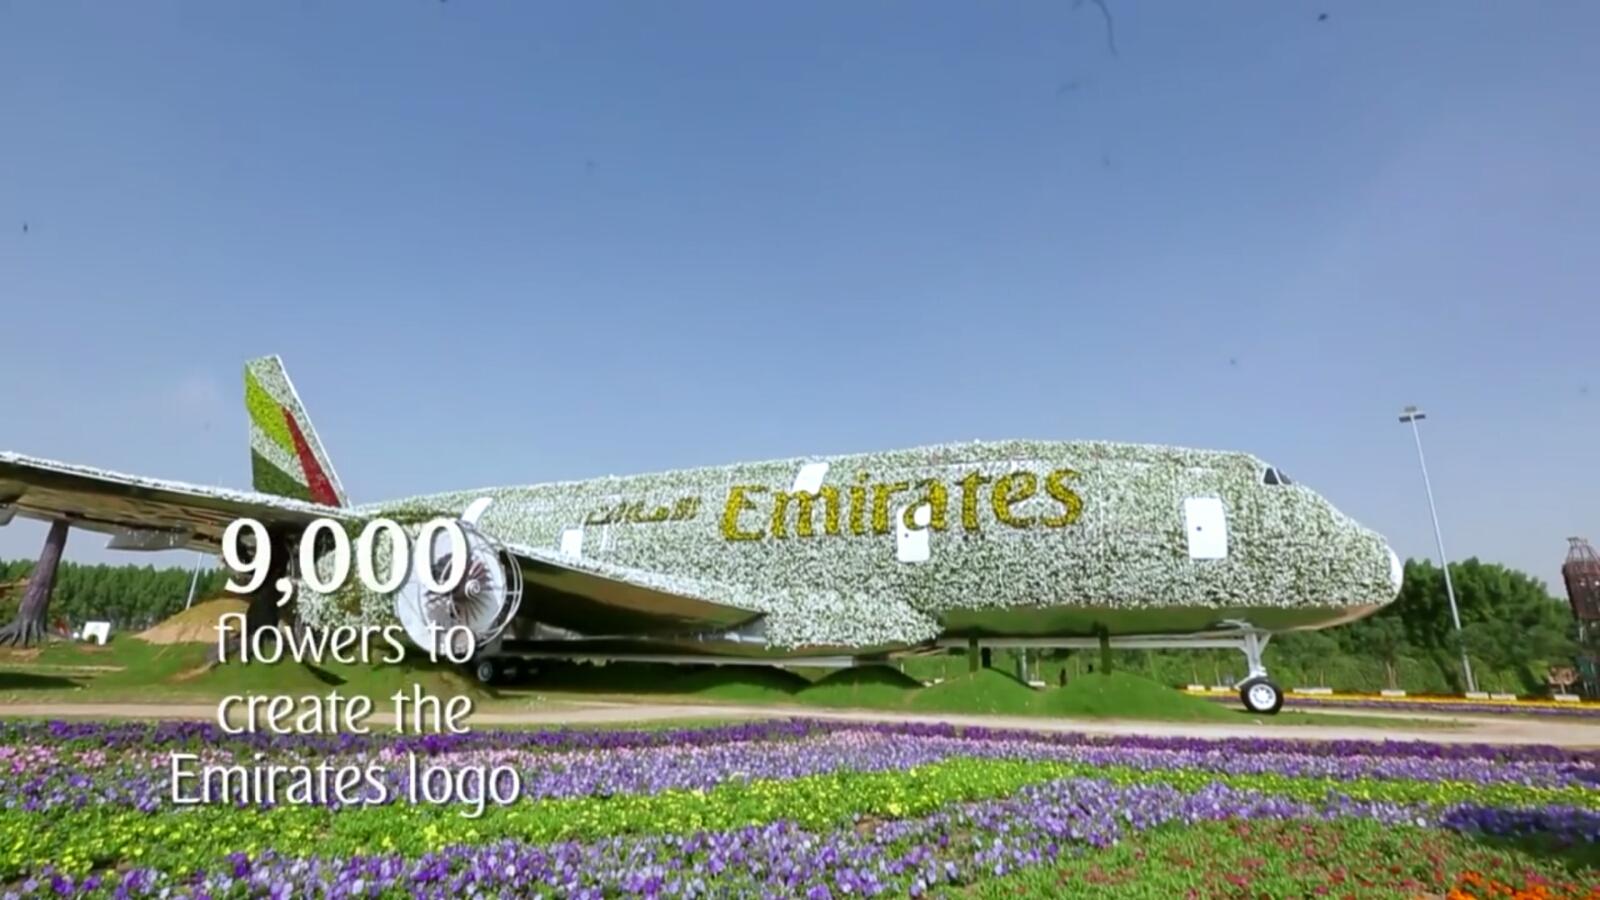 Pesawat Emirates A380 Terbuat Dari Bunga di Dubai Miracle Garden